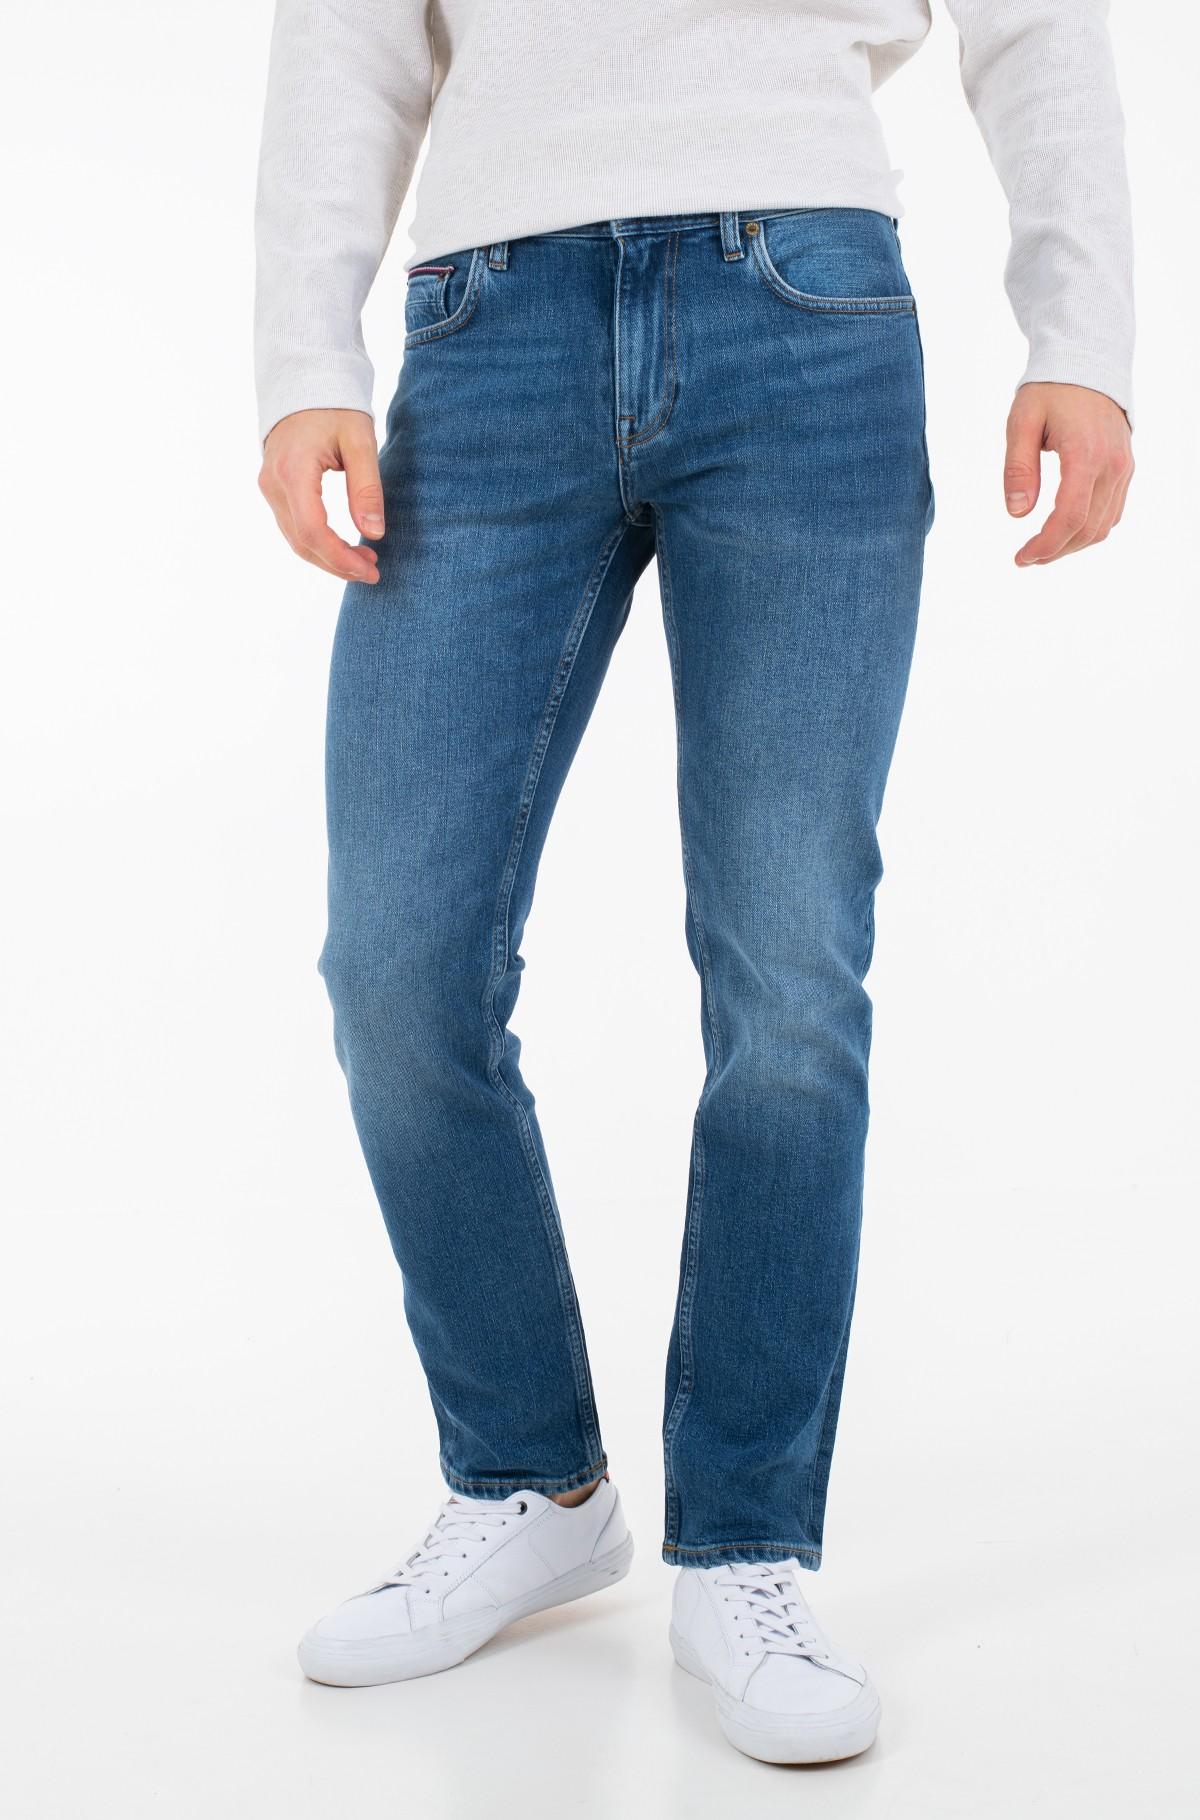 Džinsinės kelnės REGULAR MERCER STR BOSTON INDIGO-full-1